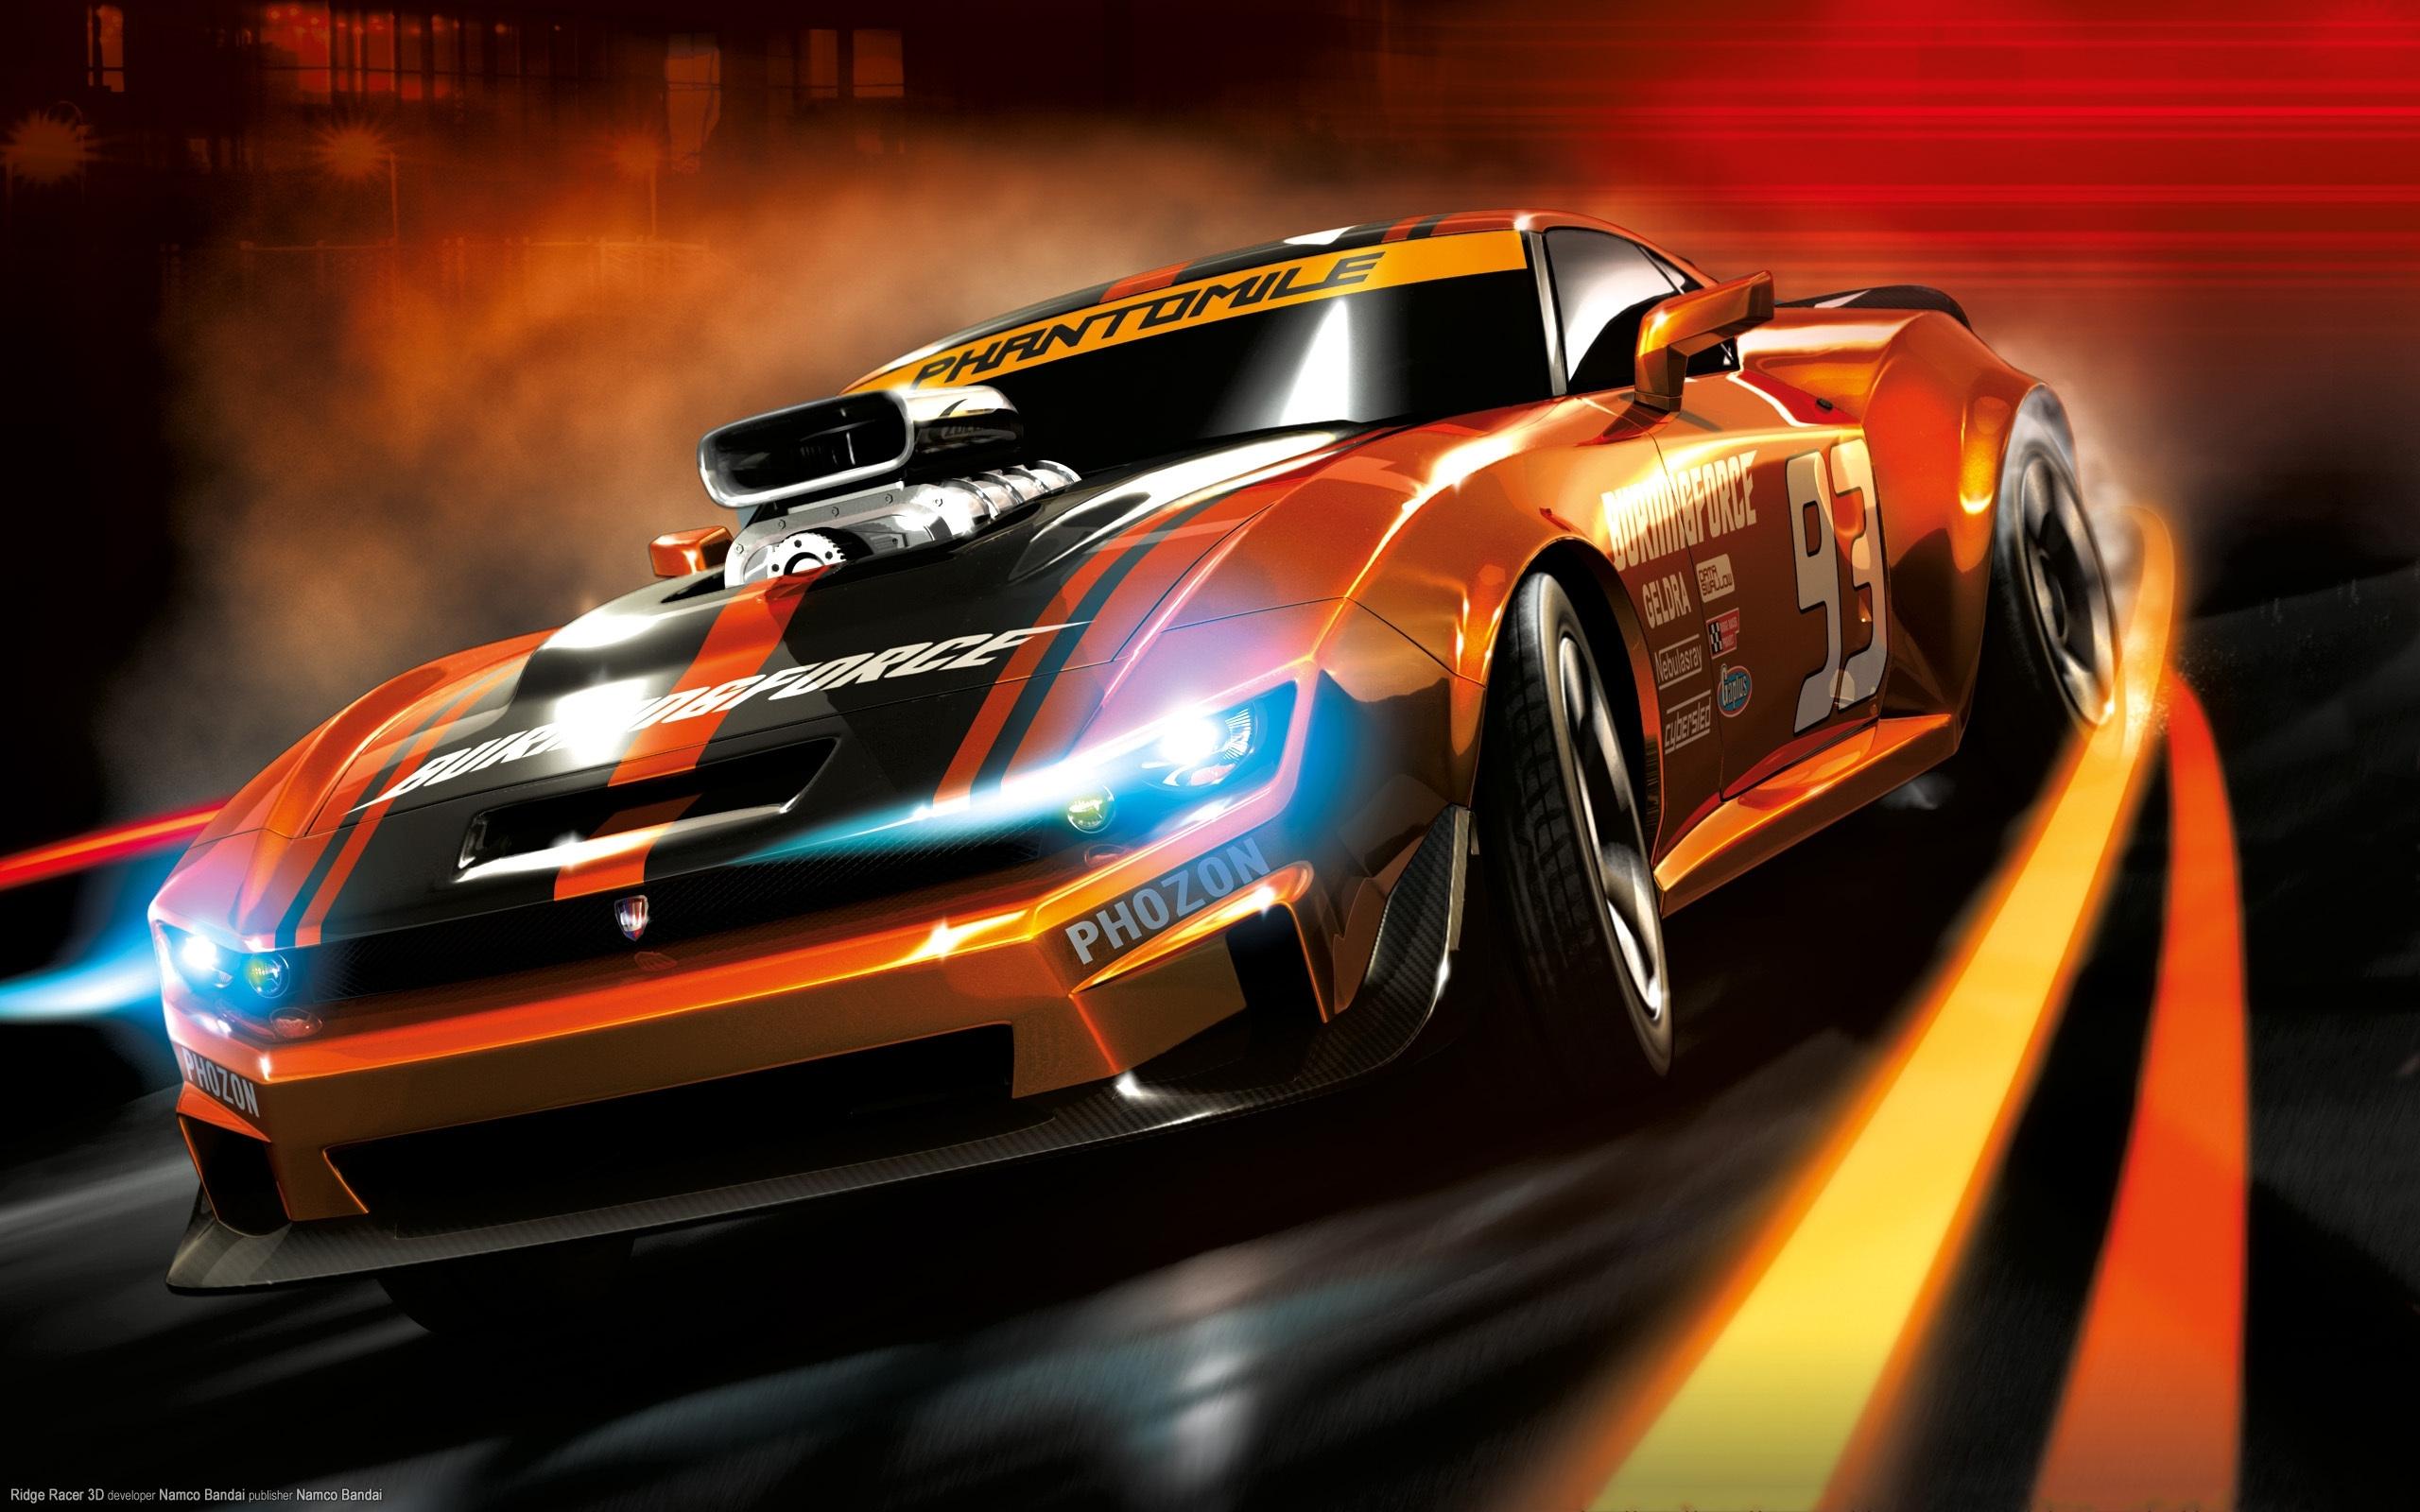 Free Ridge Racer 7 Wallpaper In 1280x800: Ridge Racer HD Wallpaper